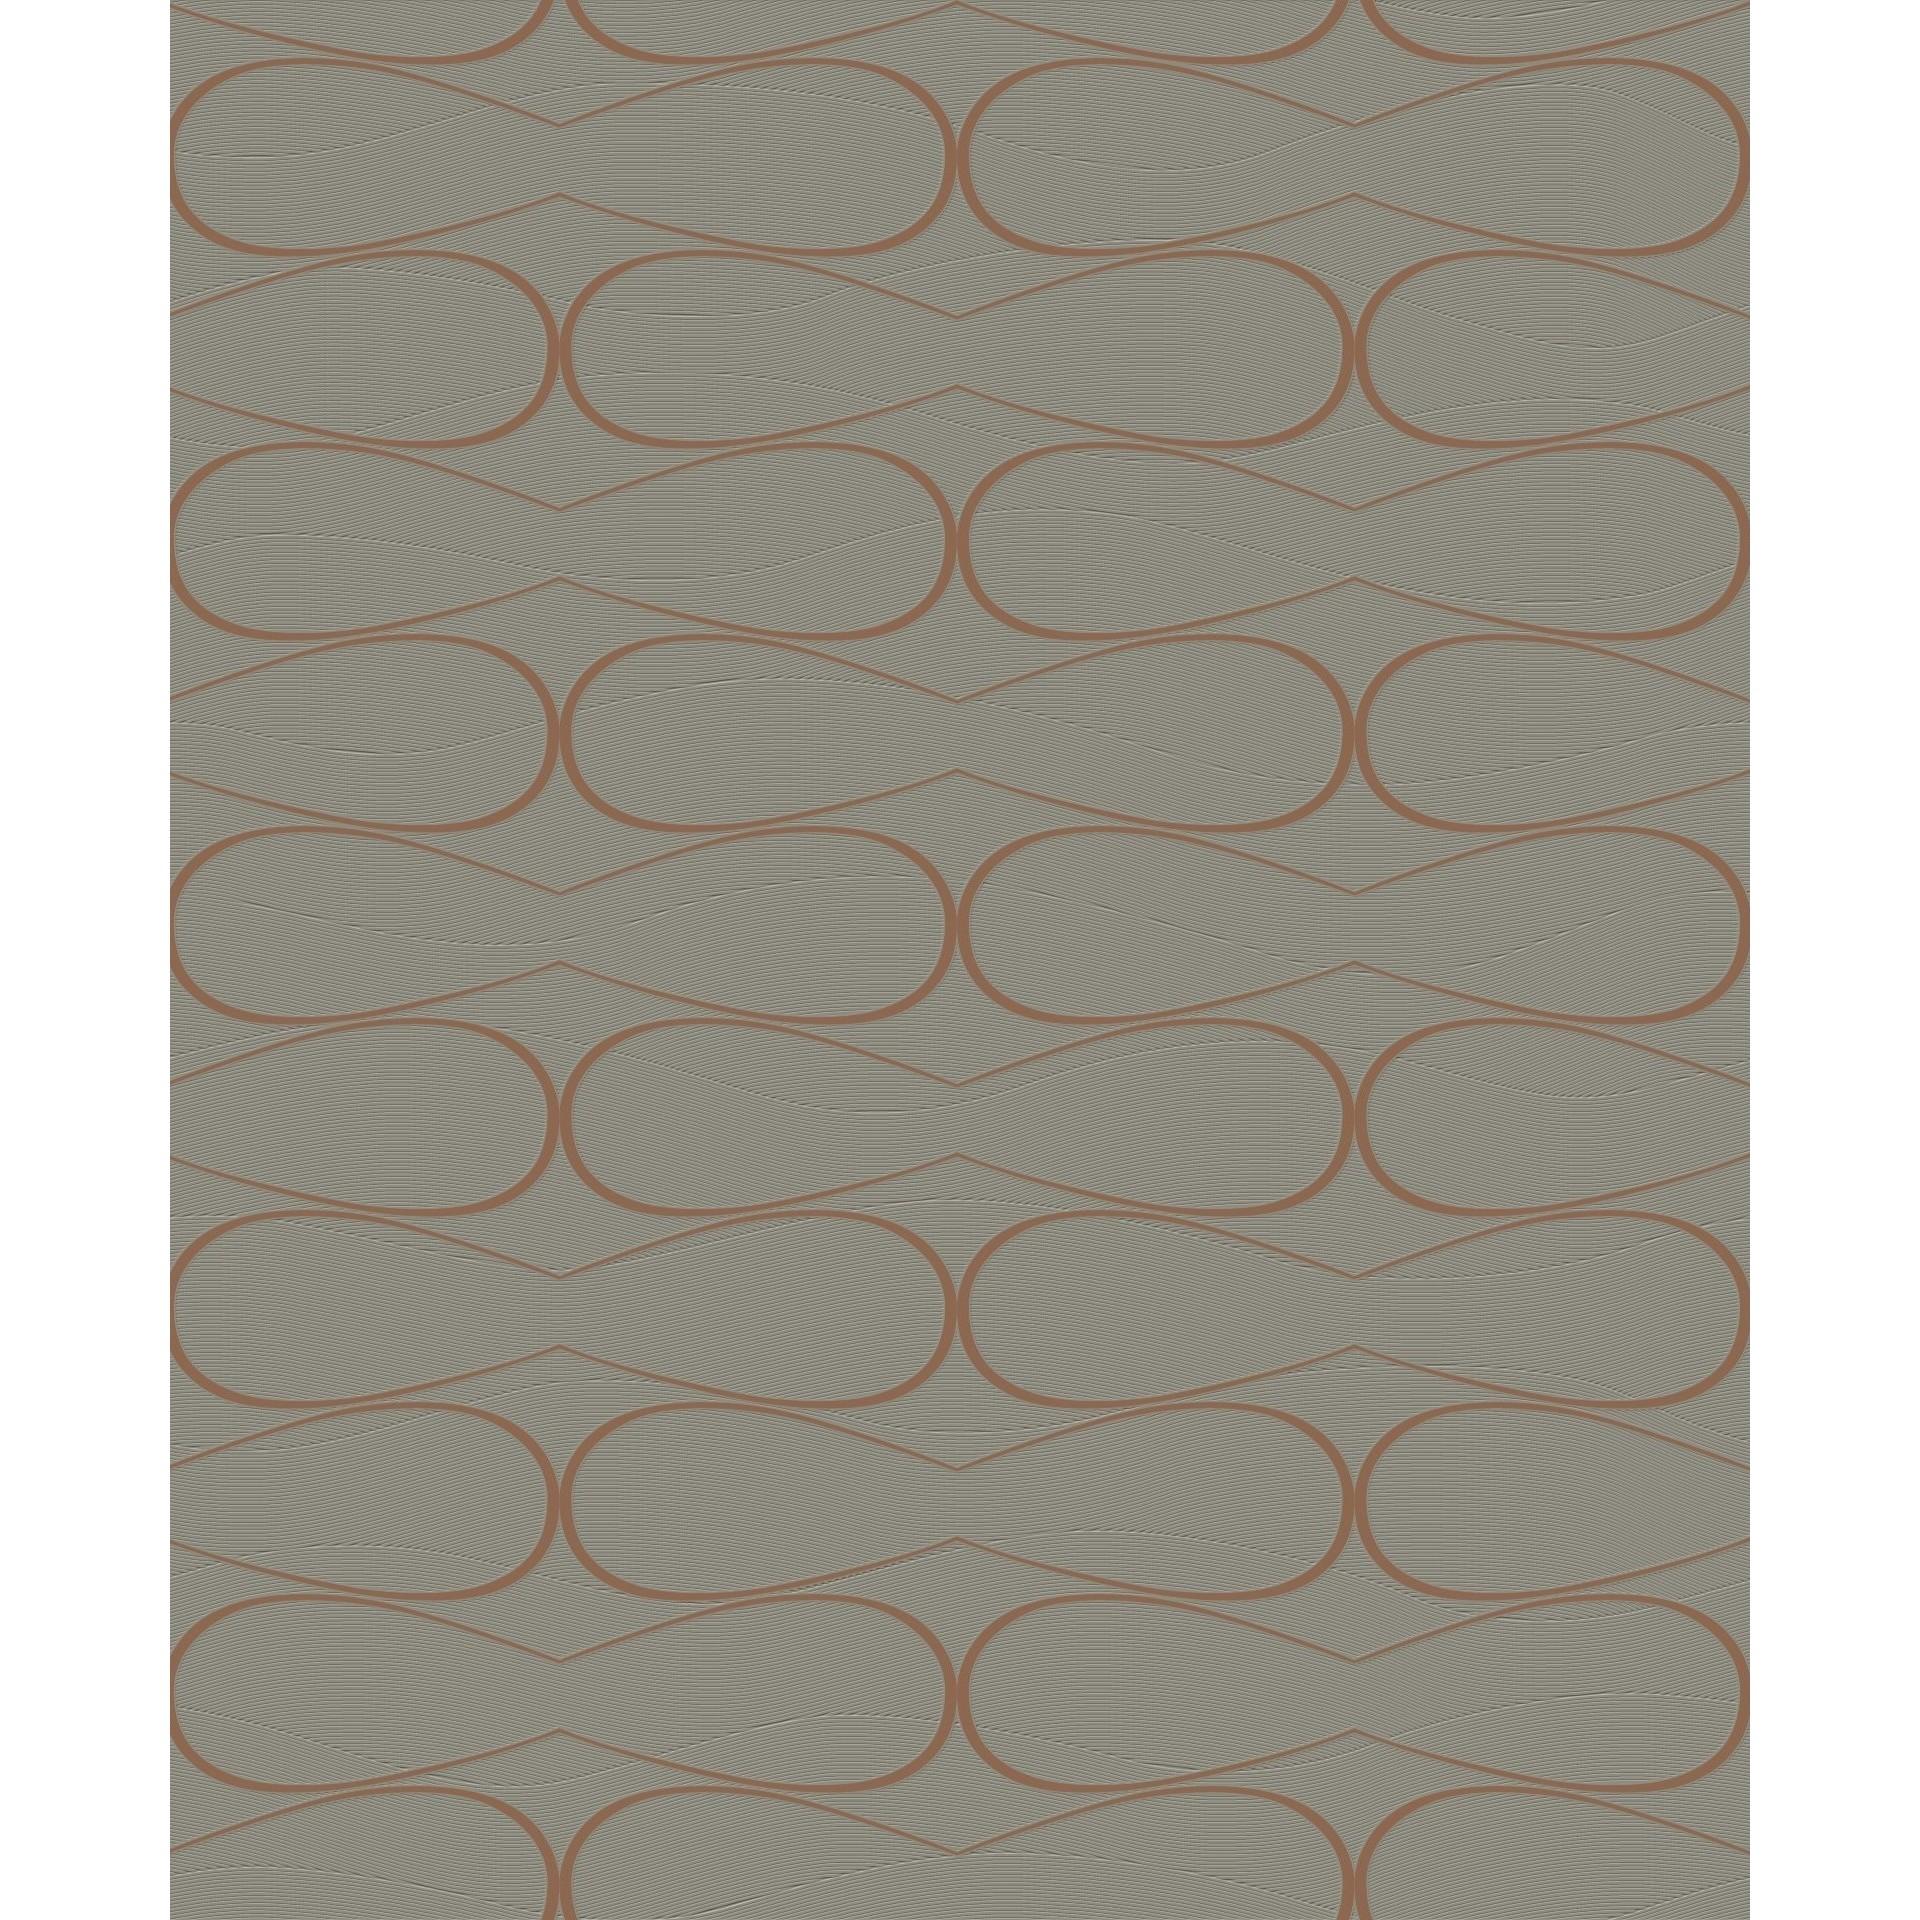 Papel de Parede 53cm x 10m Nonwoven Texturizado Roma 2015 - Jolie